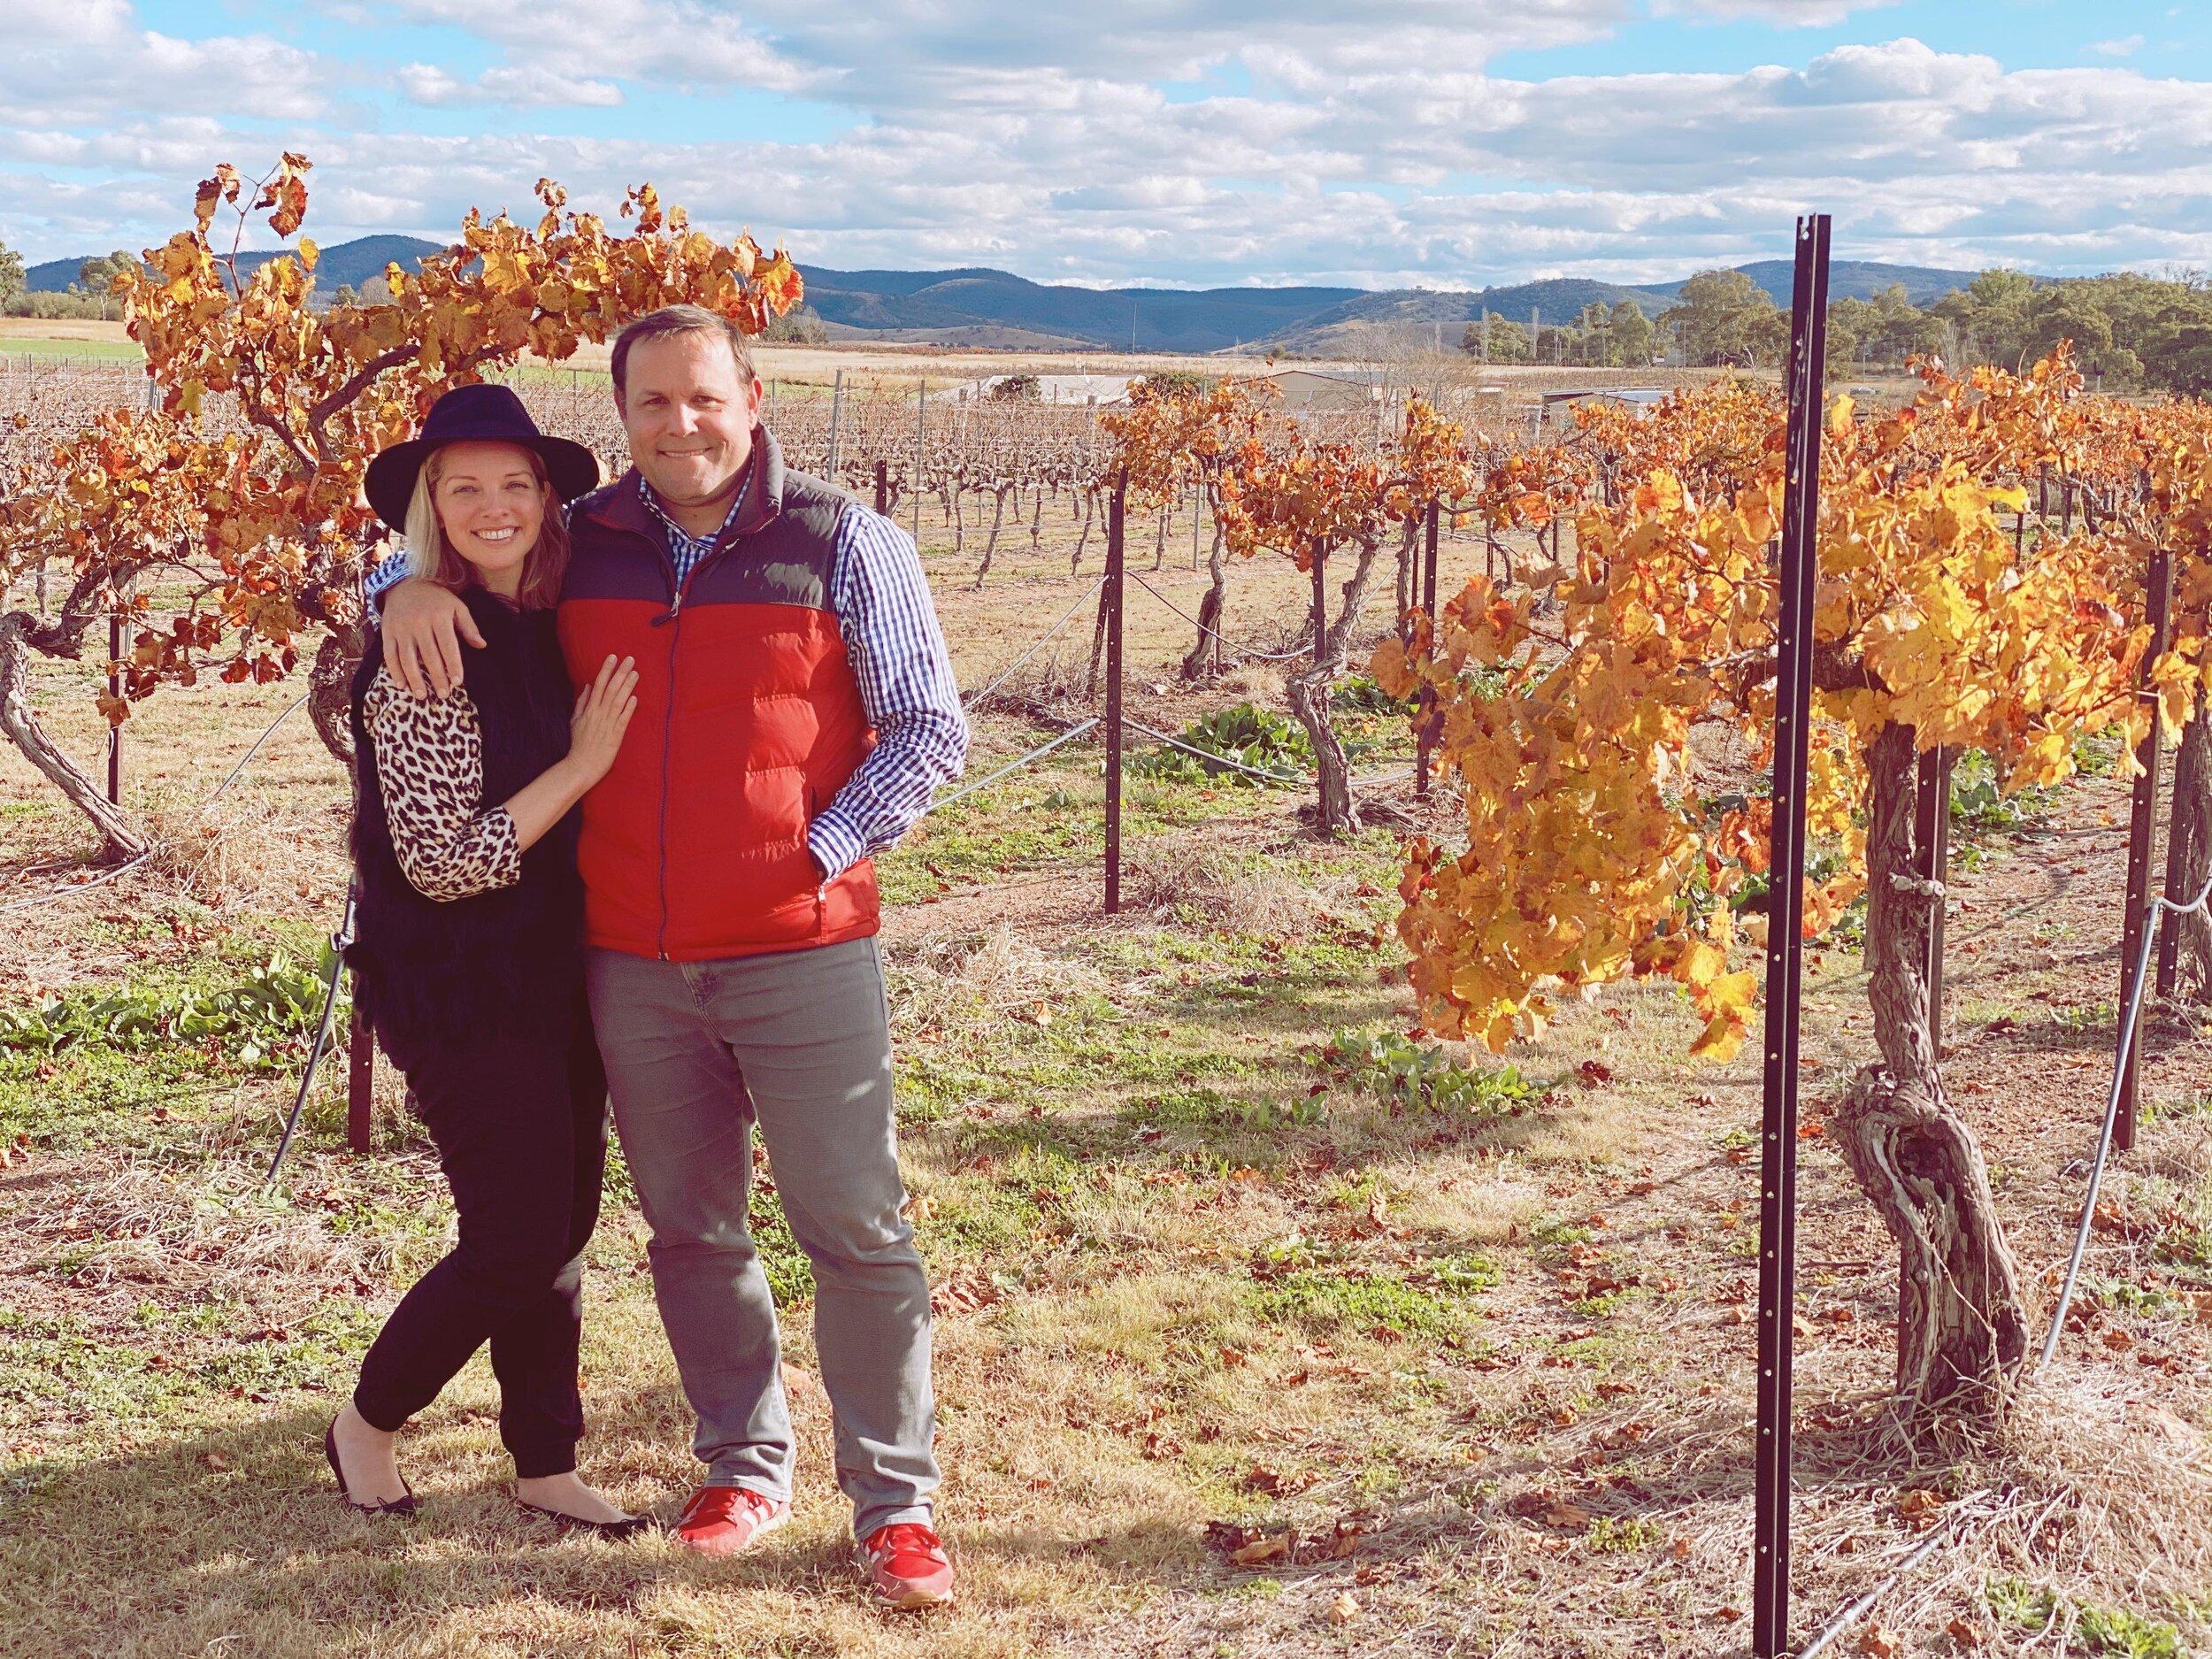 Two people standing in a vinyard